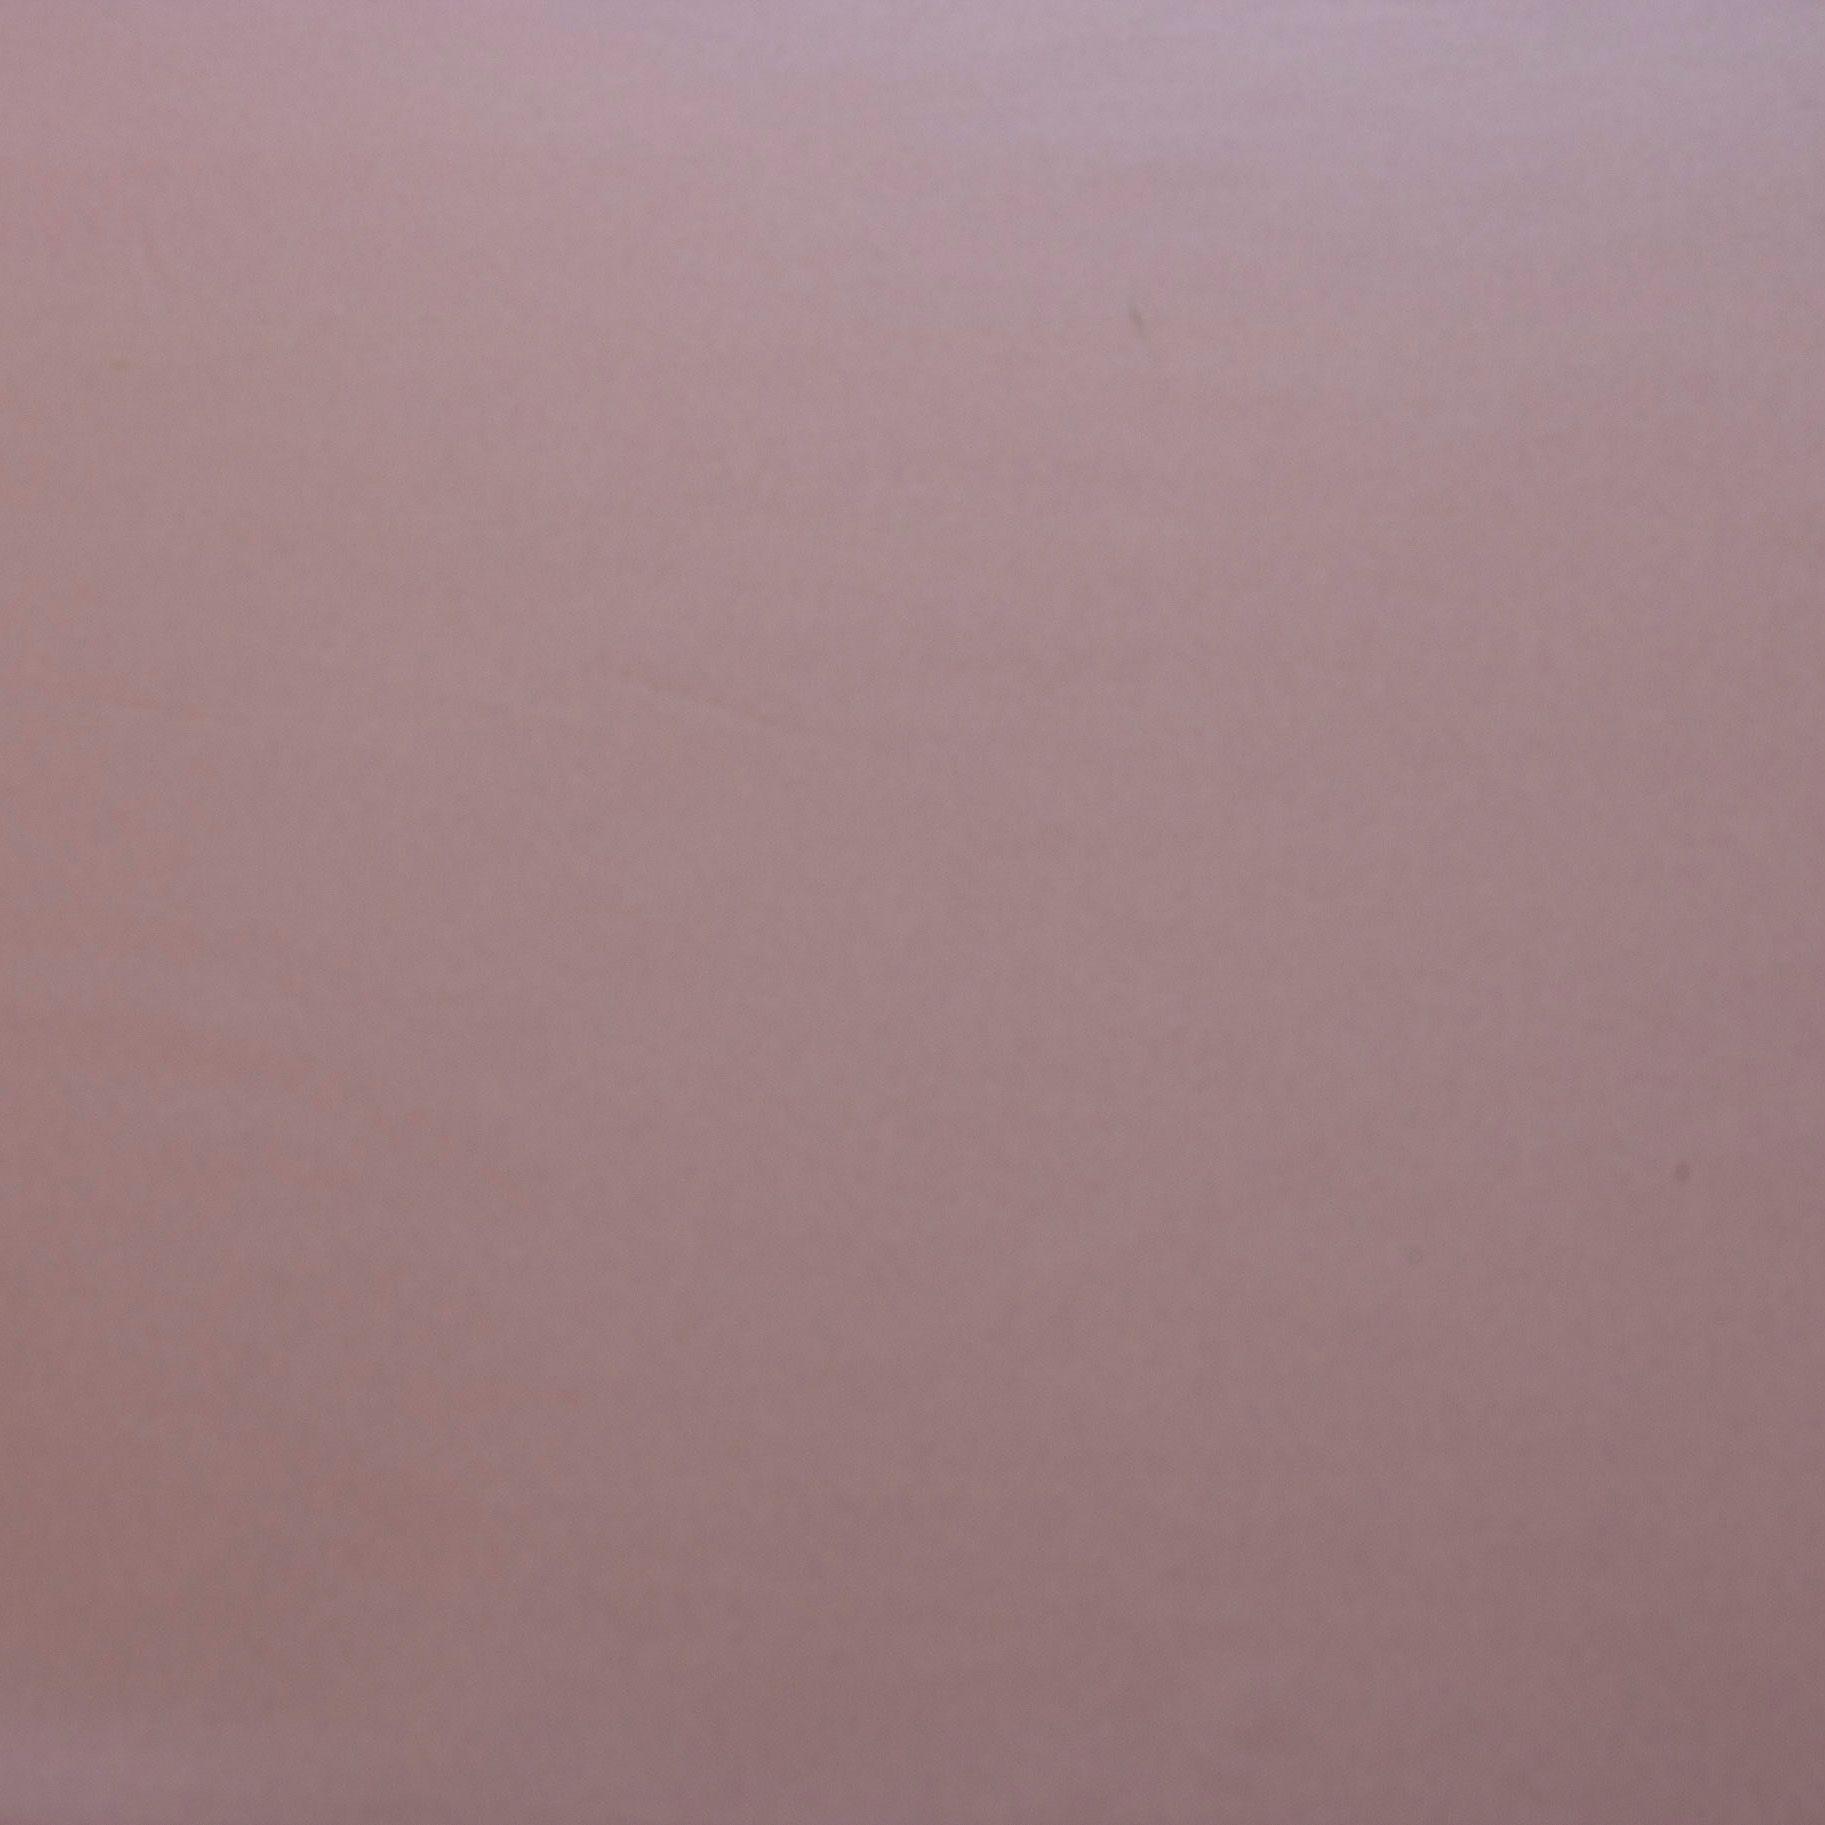 Tecido Oxford Lilas 100% Poliester 1,50 m Largura